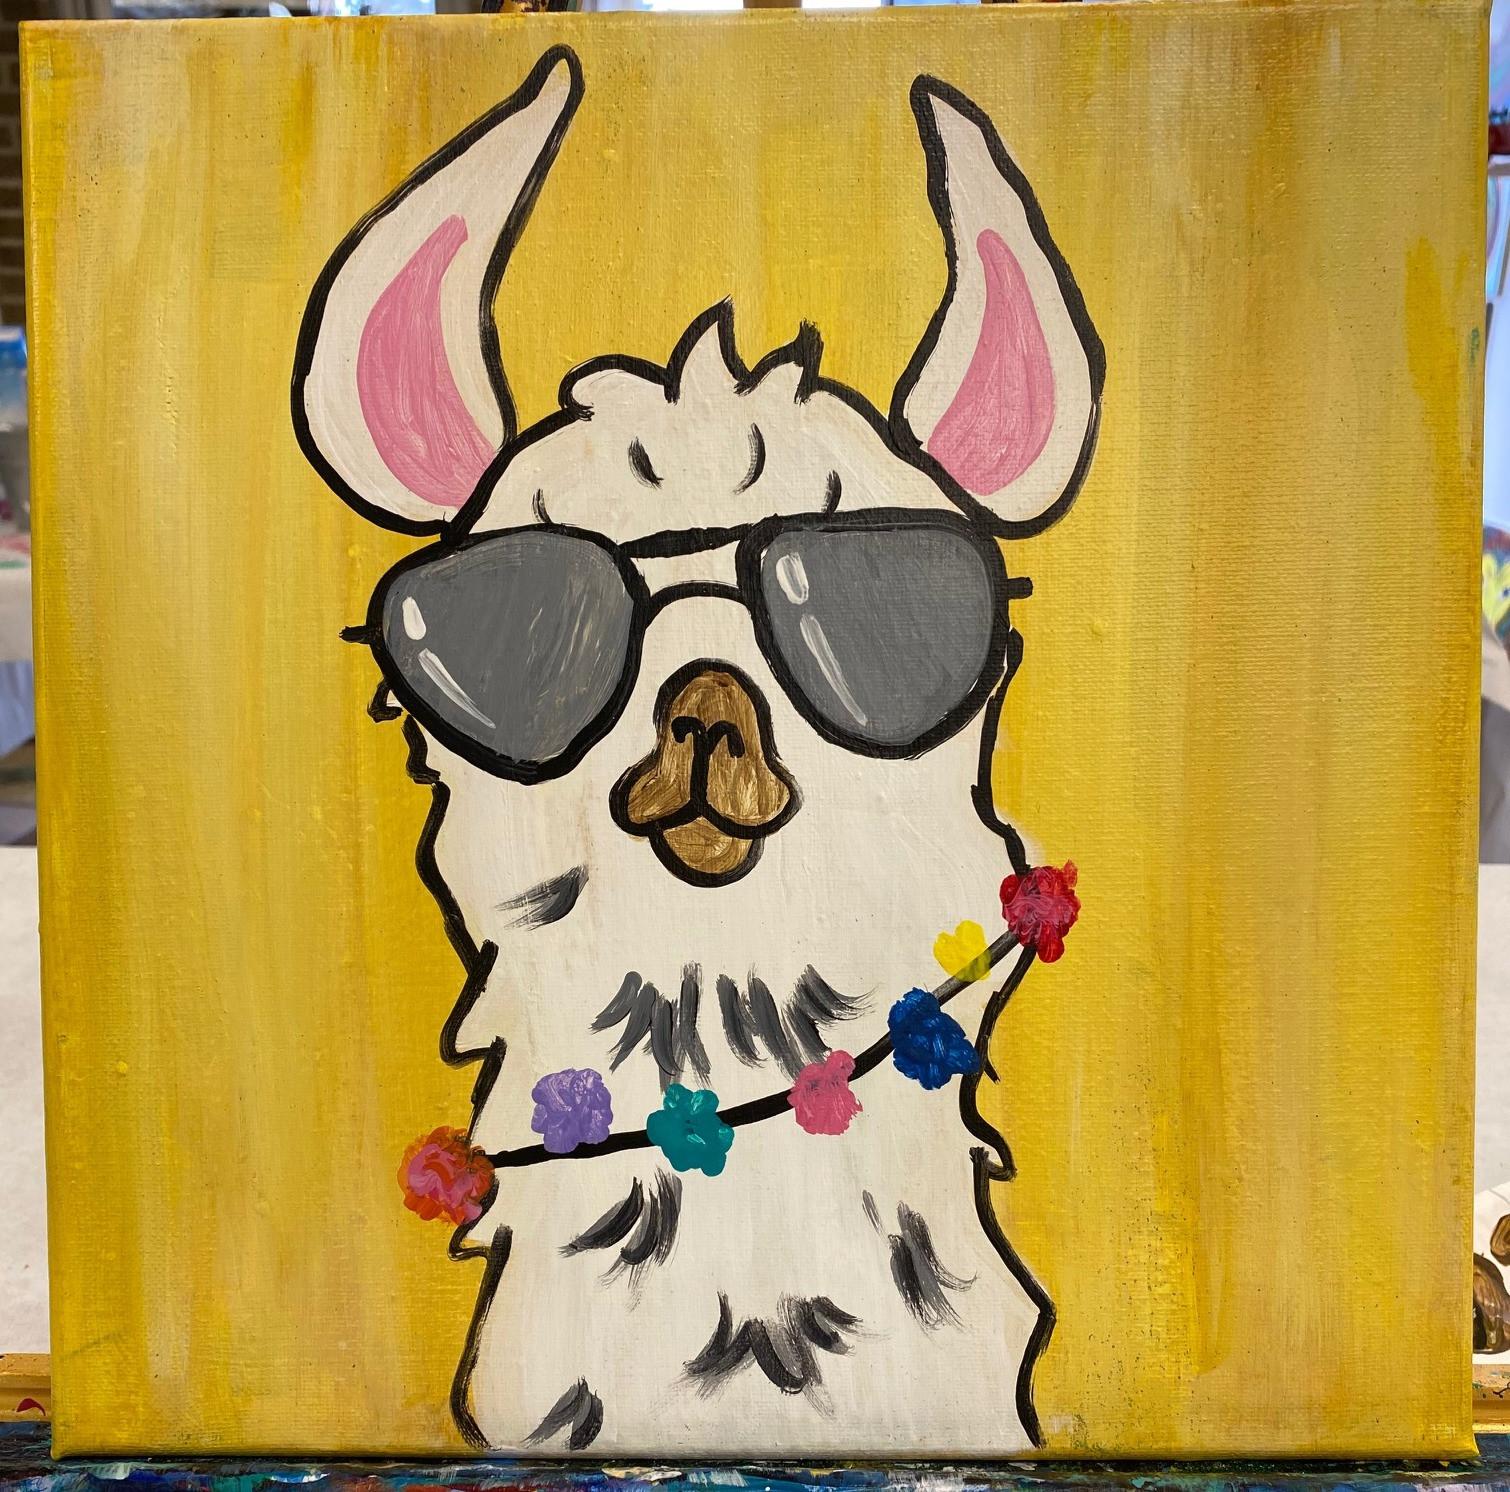 Cool as a Llama (Online)